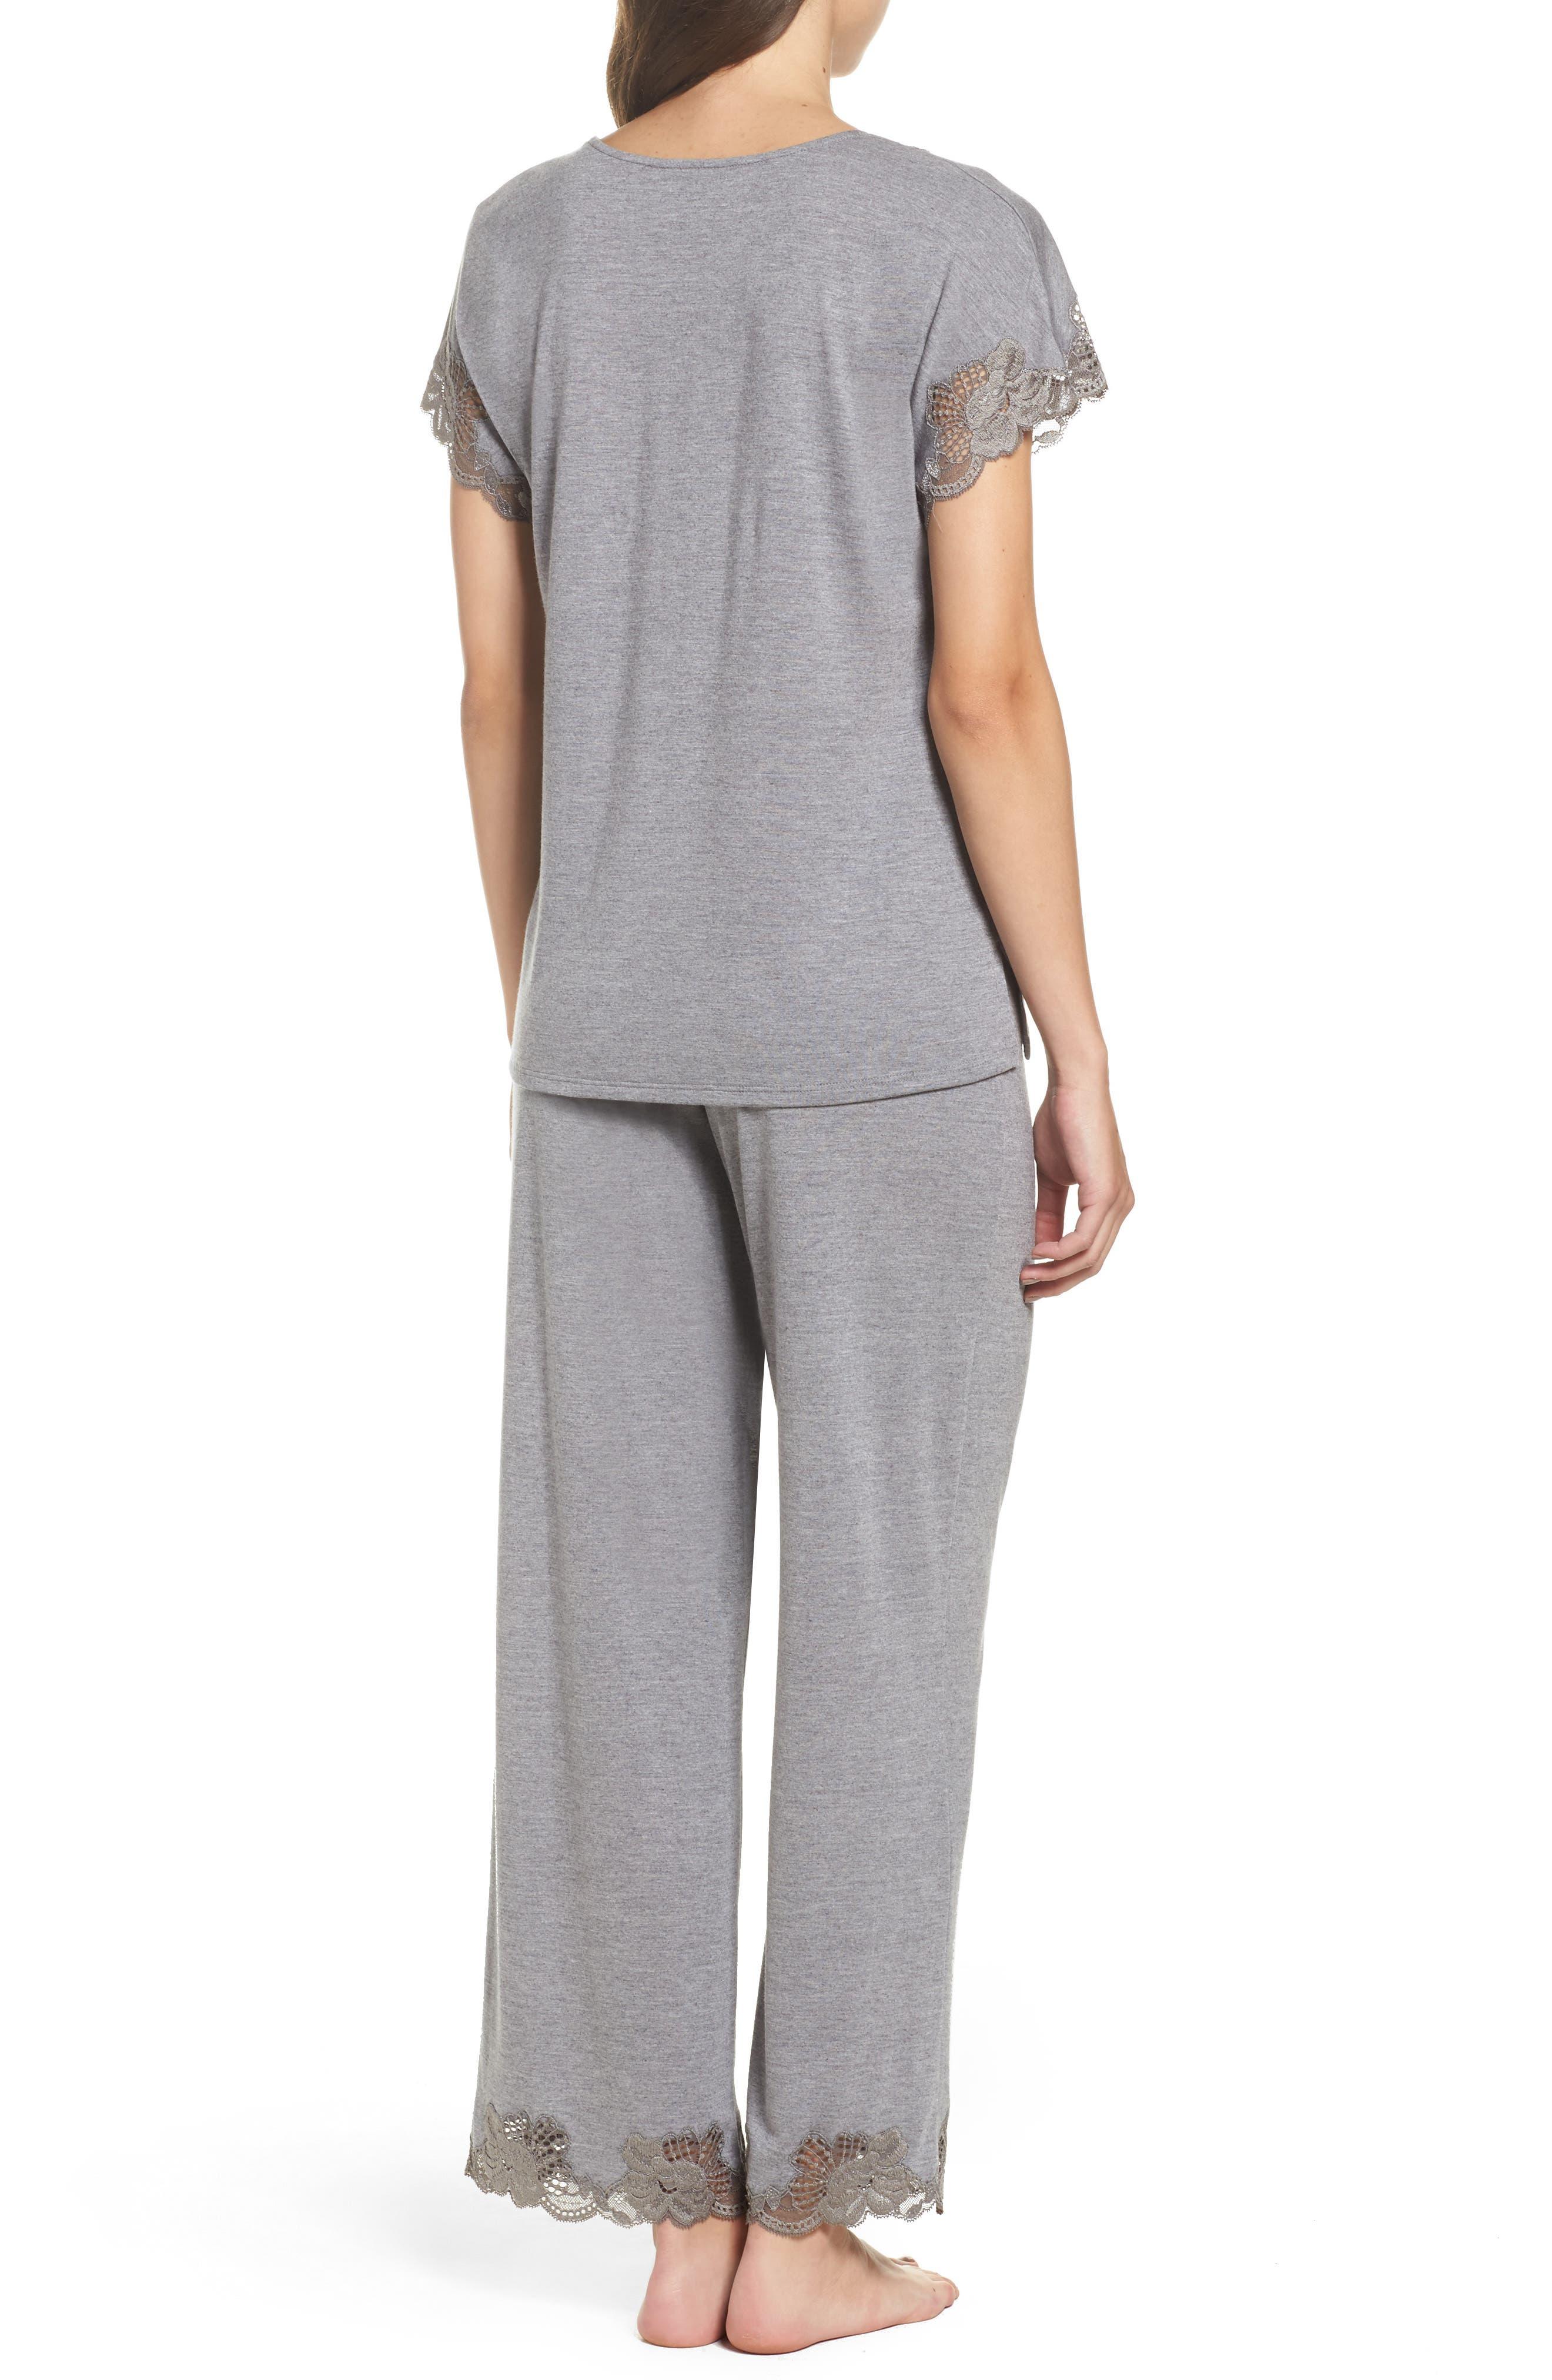 NATORI, 'Zen Floral' Pajama Set, Alternate thumbnail 2, color, 051